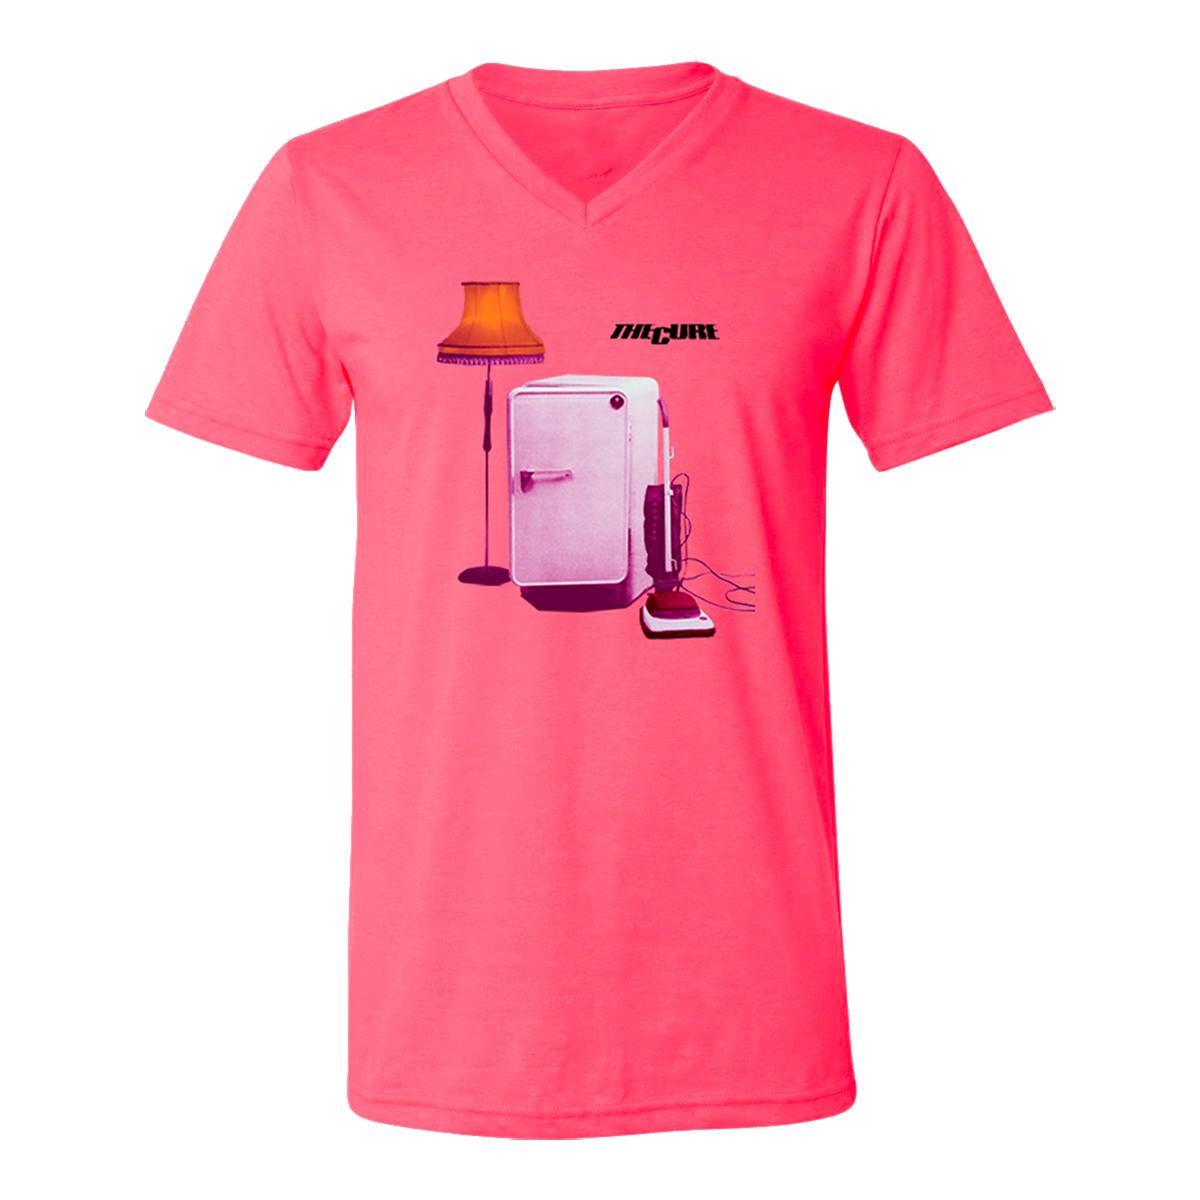 TIB Album Cover Pink V-neck T-shirt